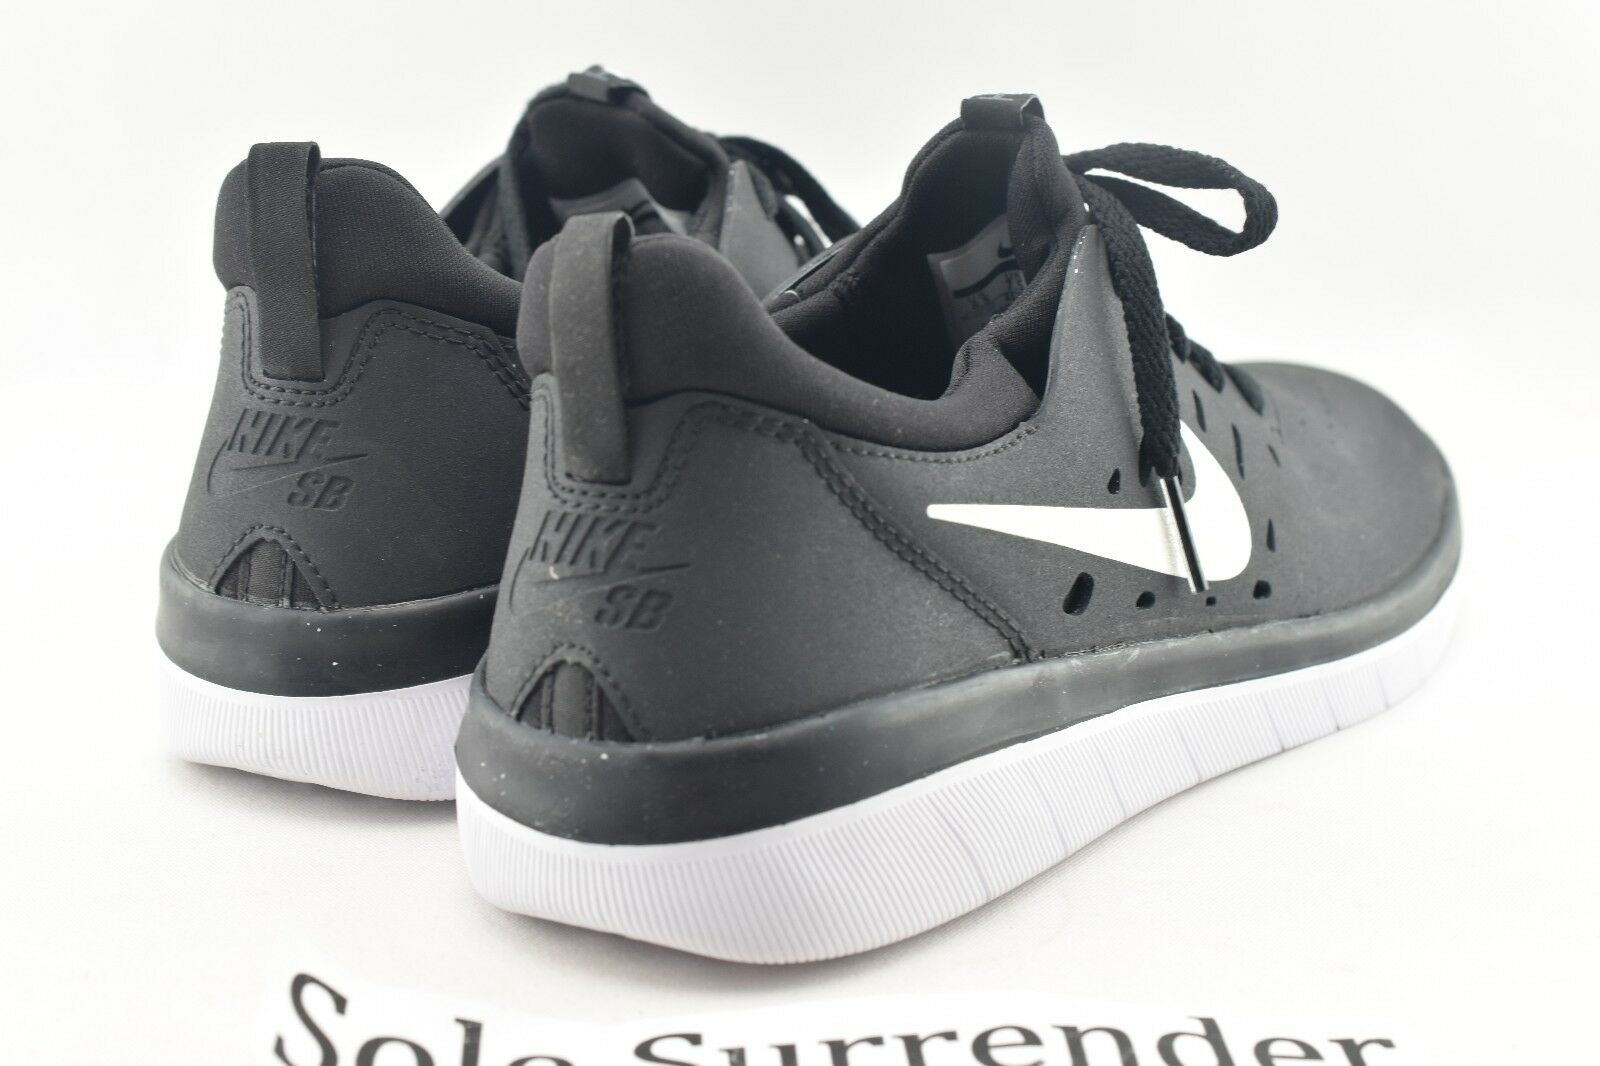 Nike sb nyjah aa4272-001 libera scegliere taglia aa4272-001 nyjah houston white skateboarding 147fc1